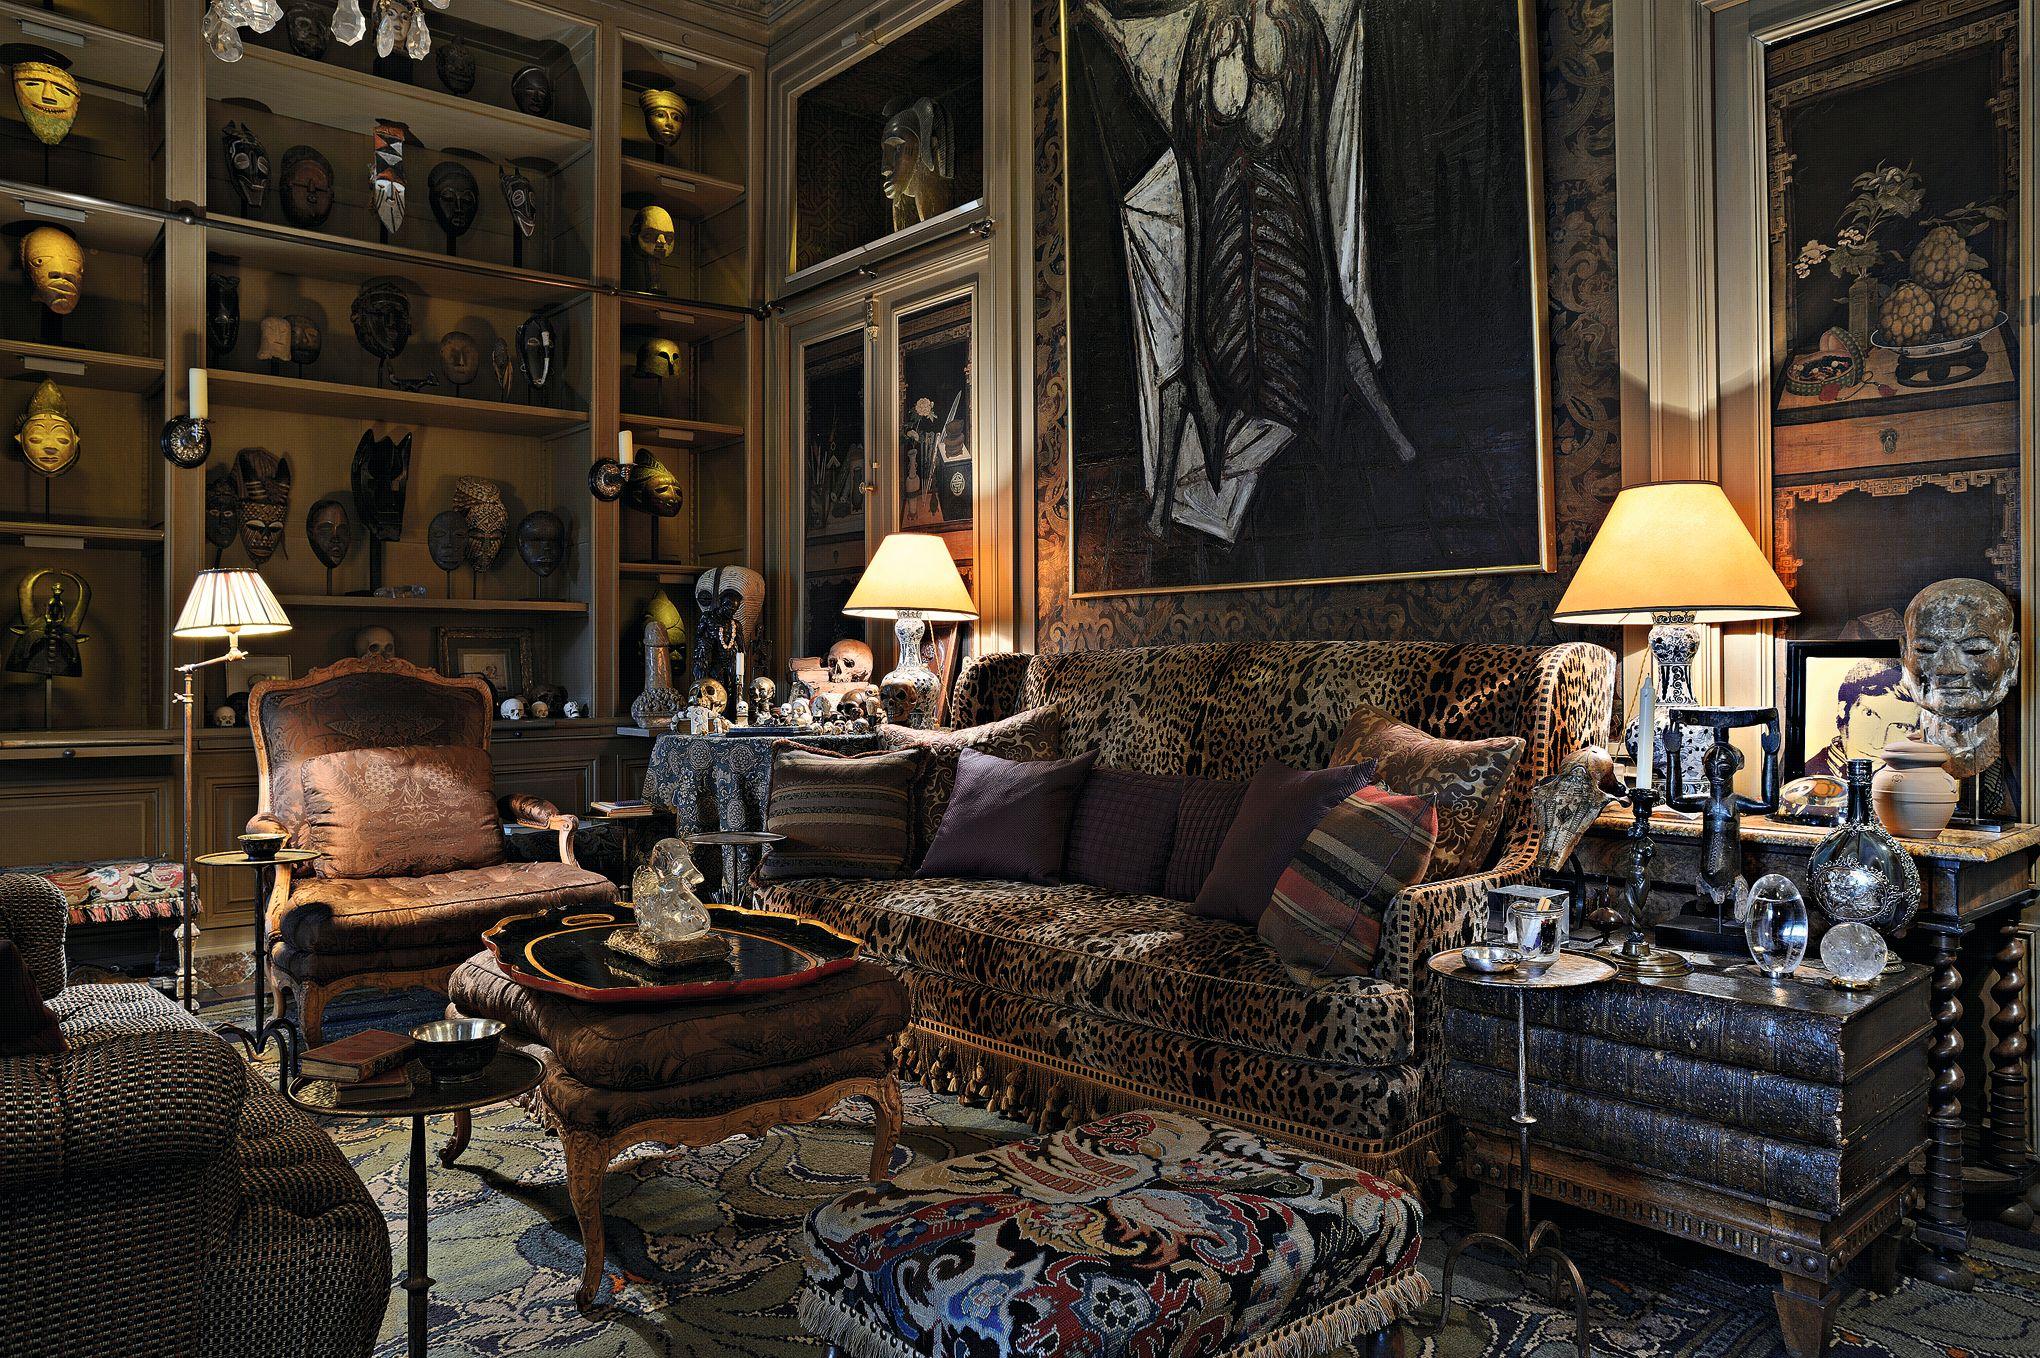 le cabinet de curiosit s de pierre berg. Black Bedroom Furniture Sets. Home Design Ideas